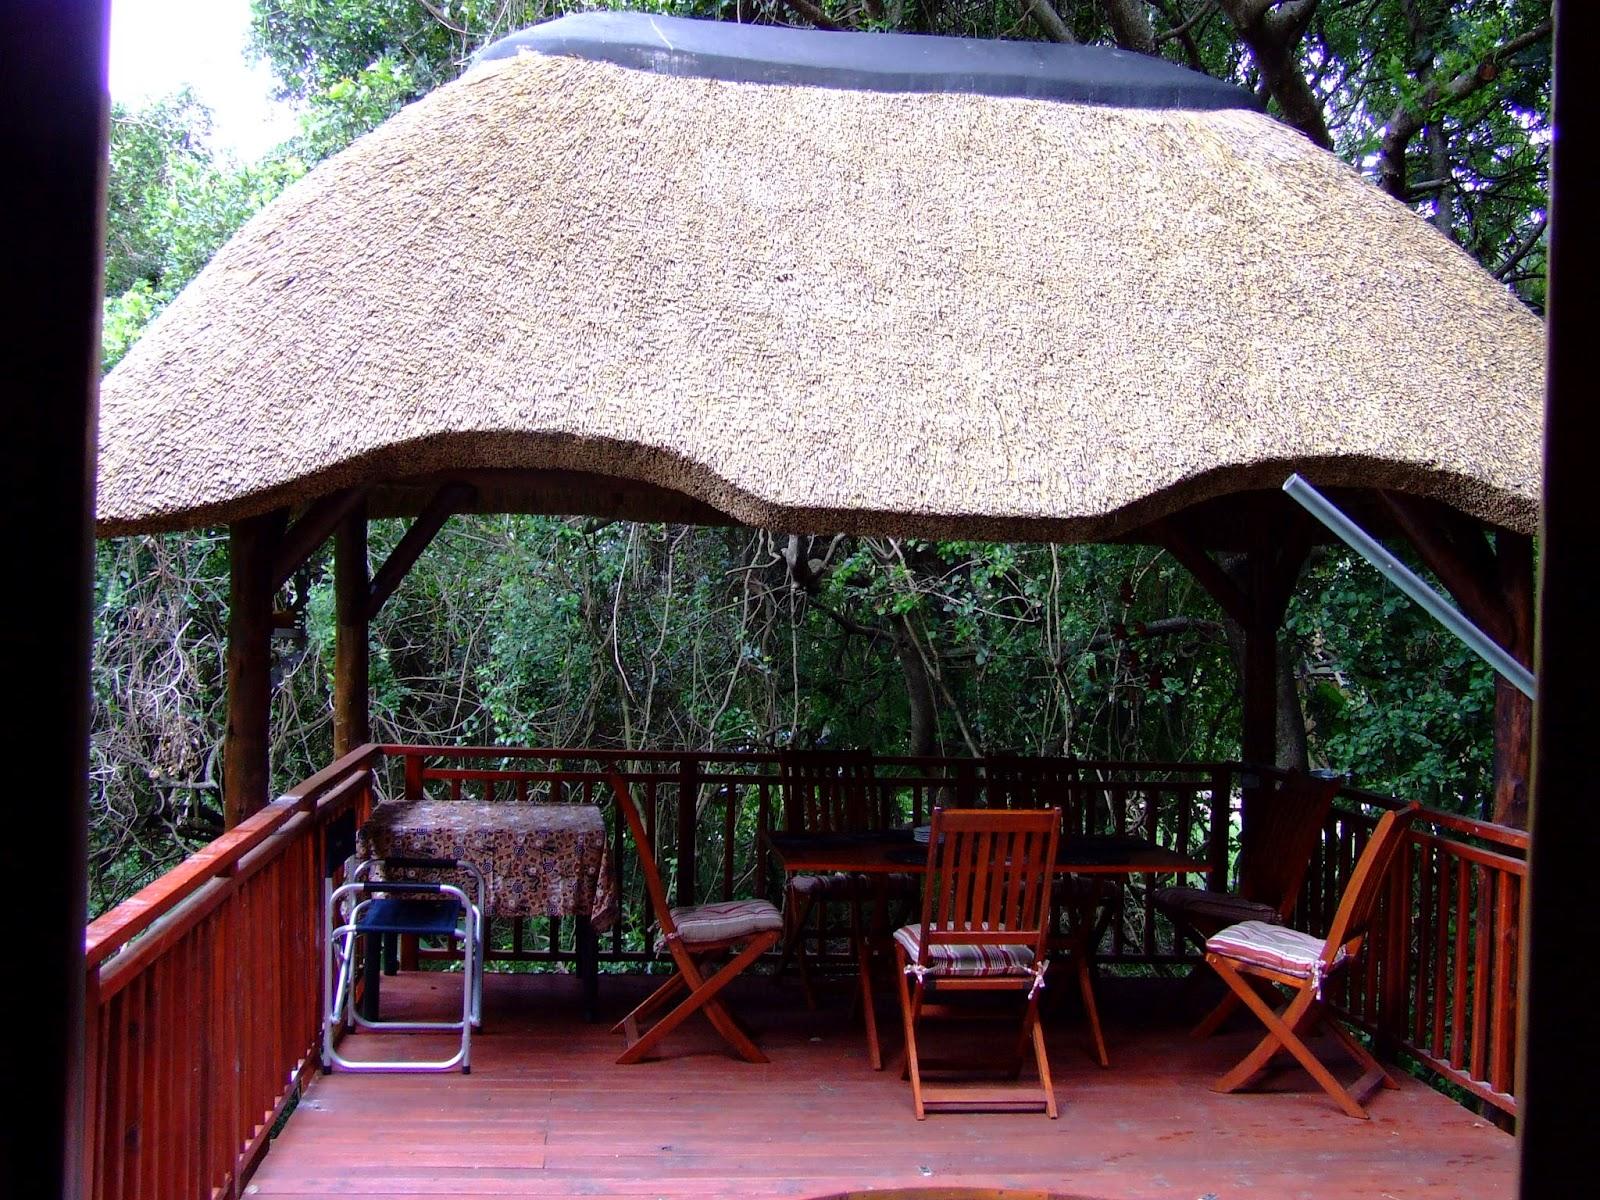 Thatch Lapa, Braai & Outdoor Entertainment Area Designs on Small Backyard Entertainment Area Ideas id=51968